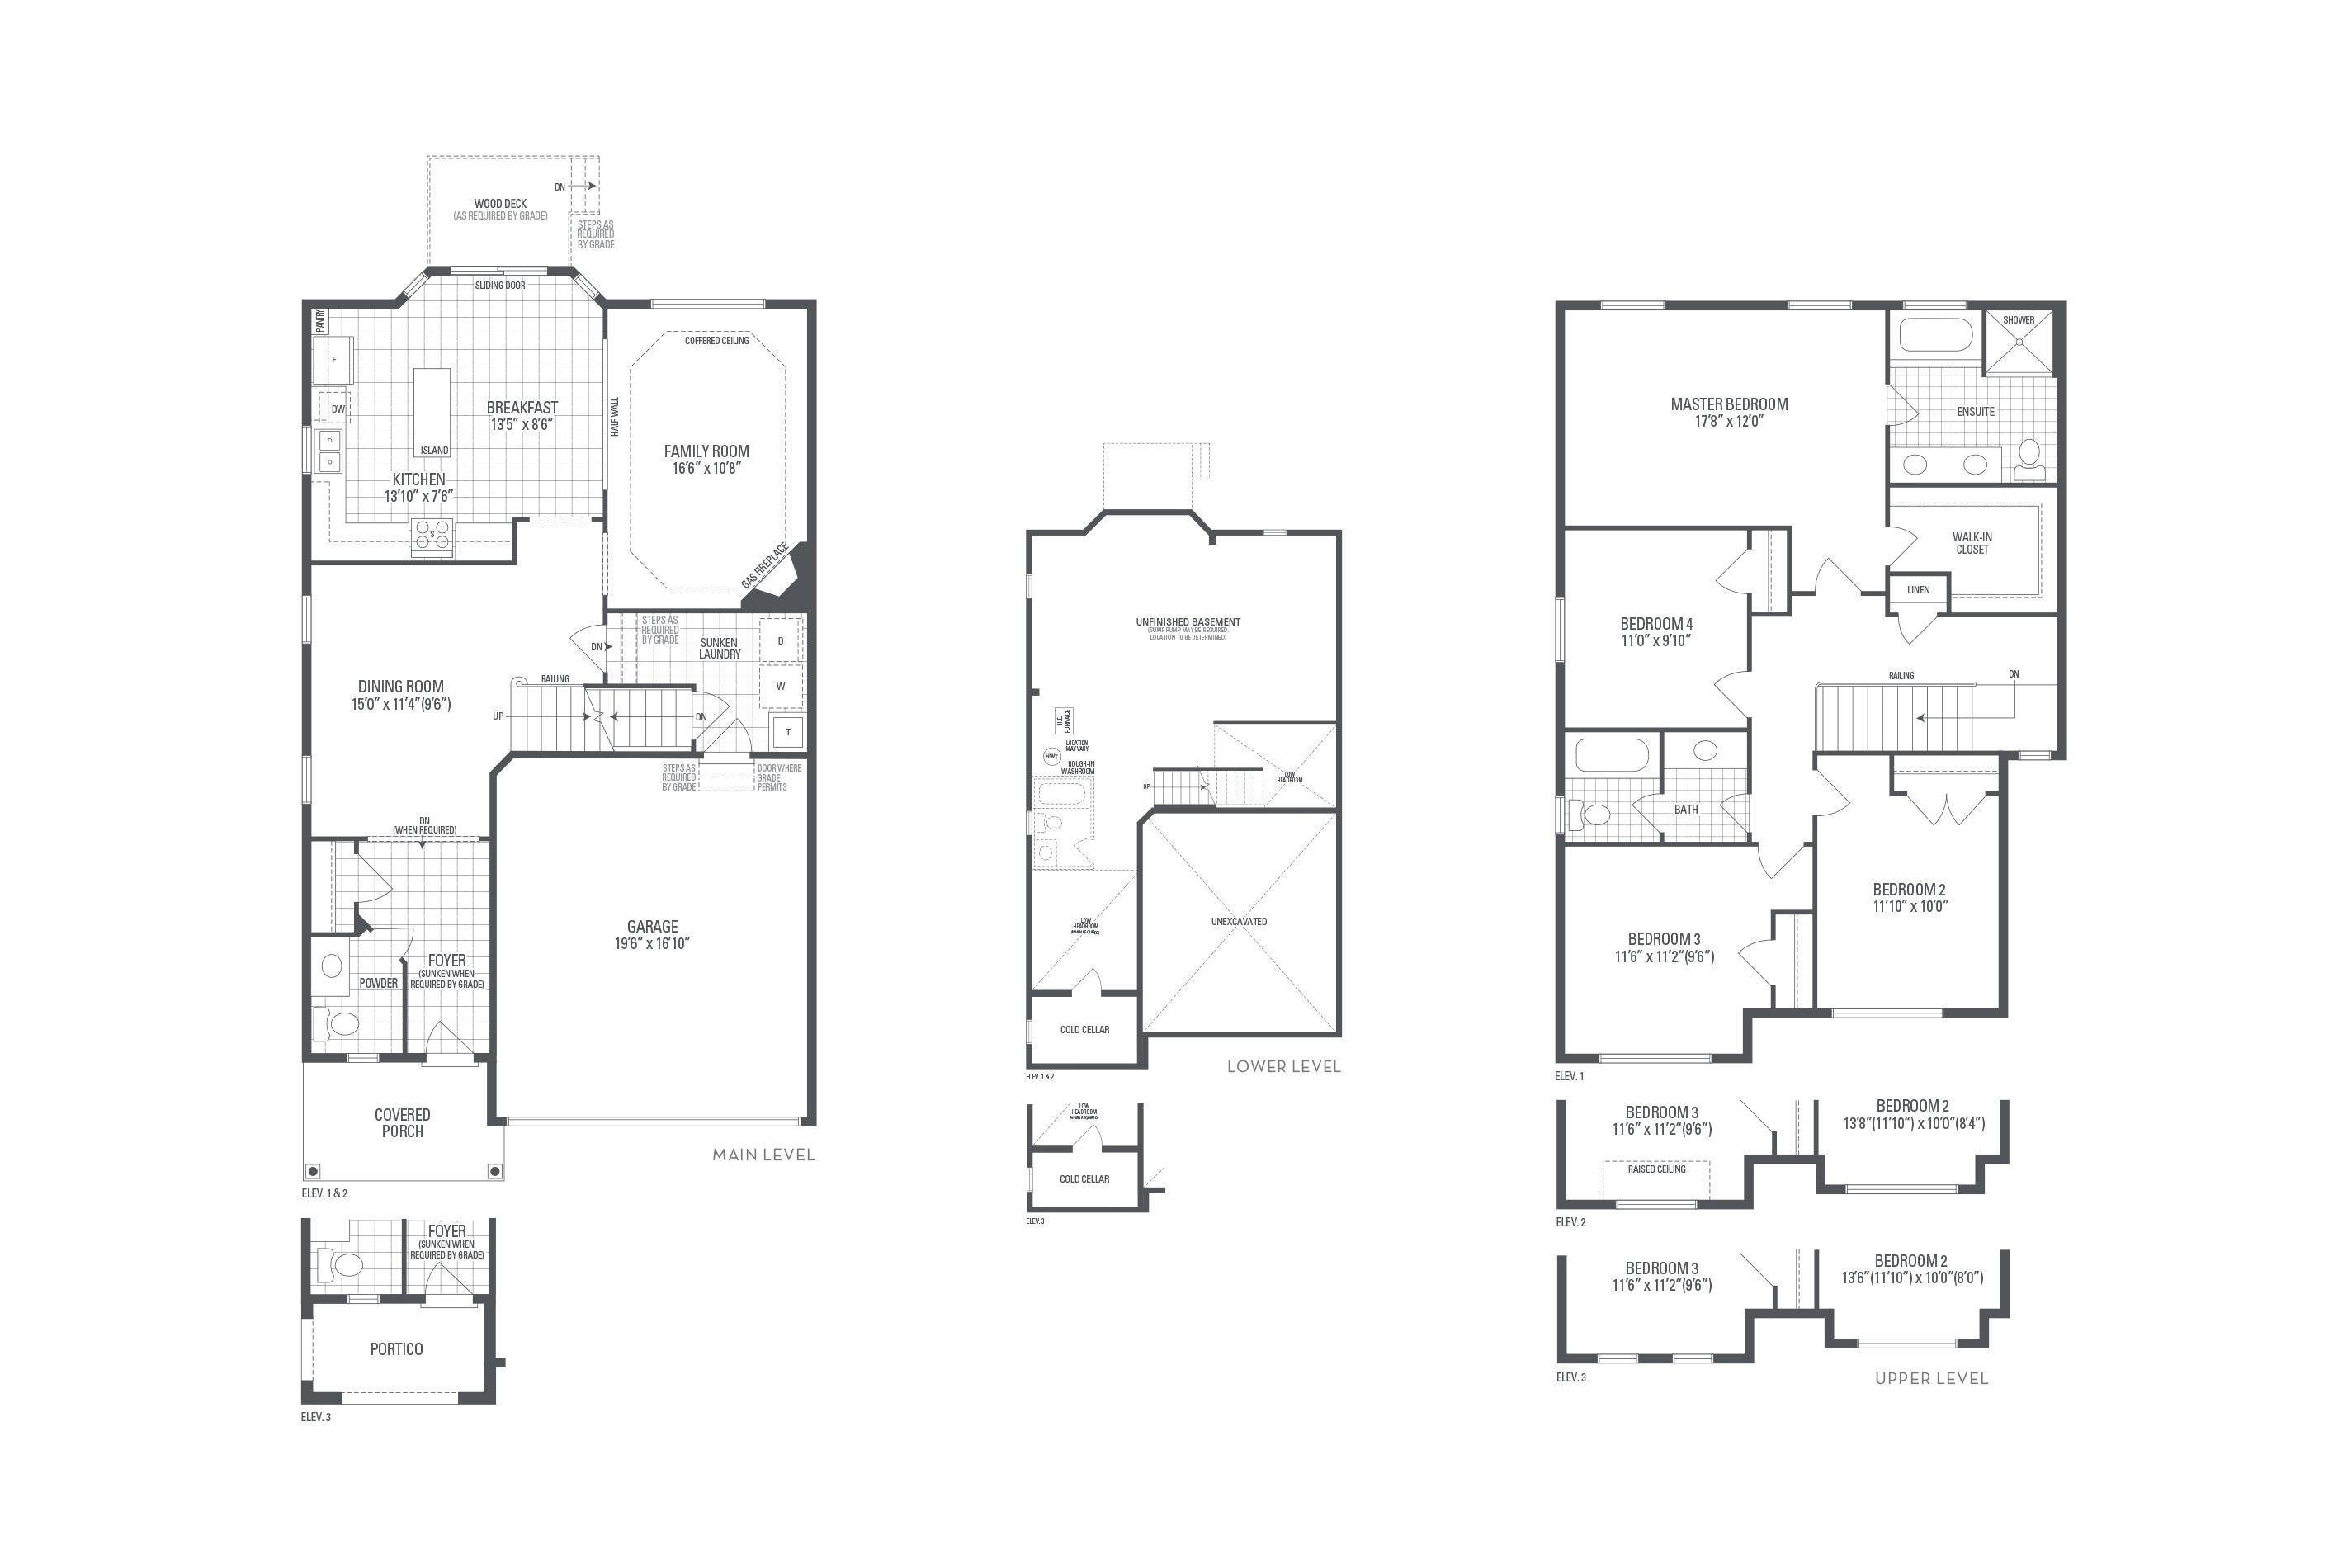 Bronte 02 Elev. 2 Floorplan Thumbnail